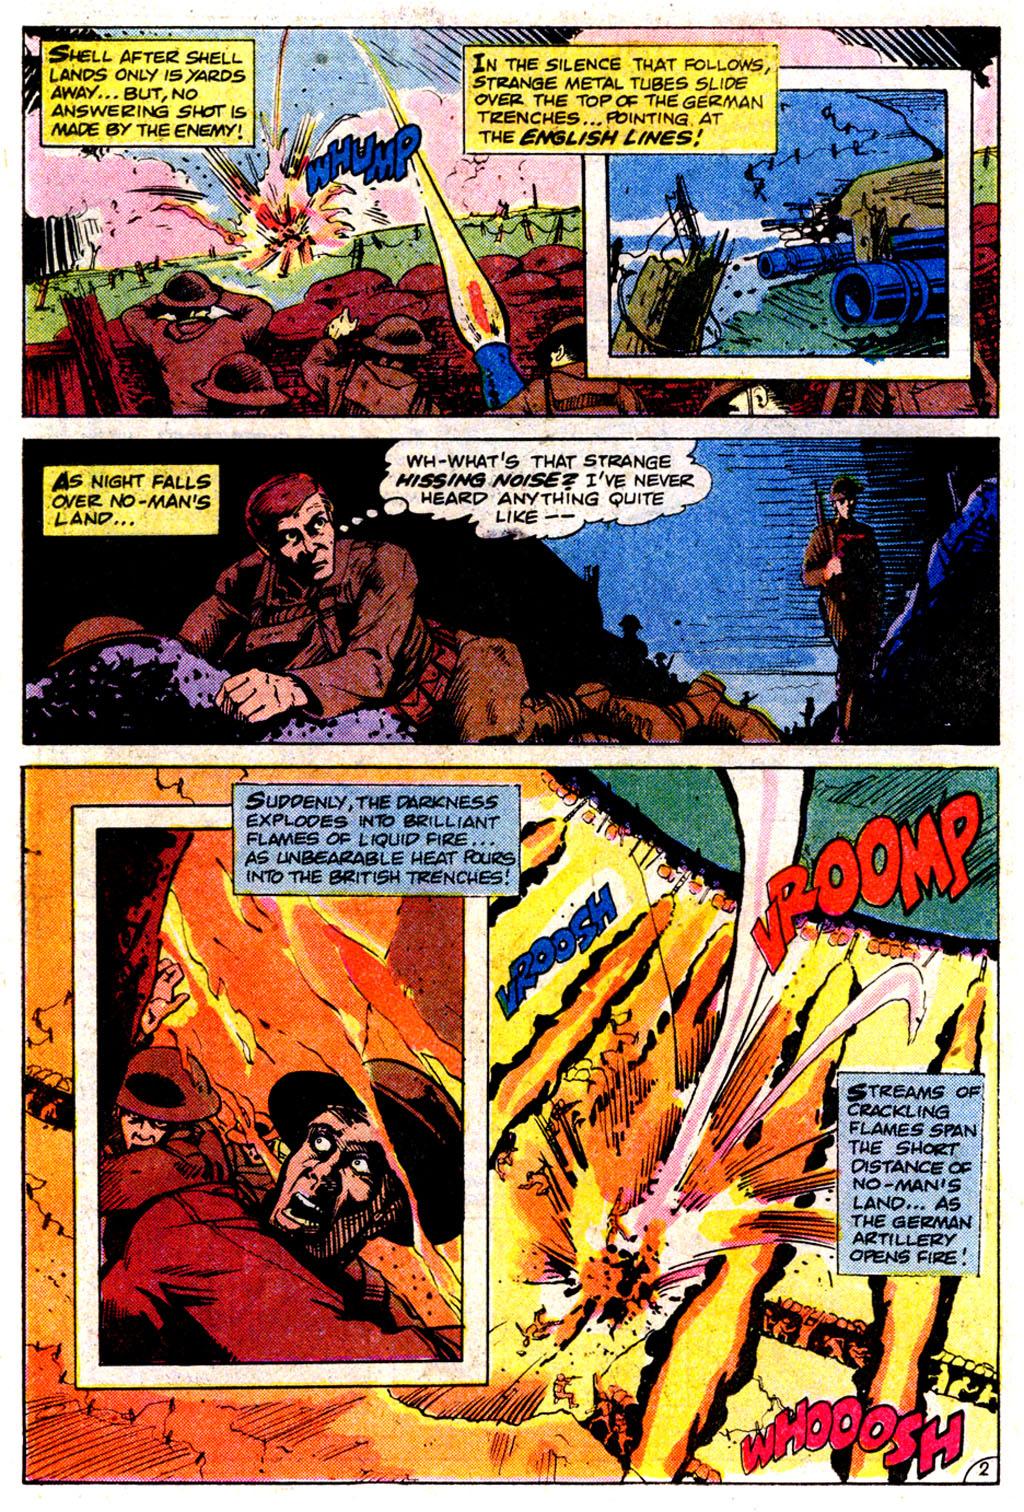 Read online Sgt. Rock comic -  Issue #354 - 18